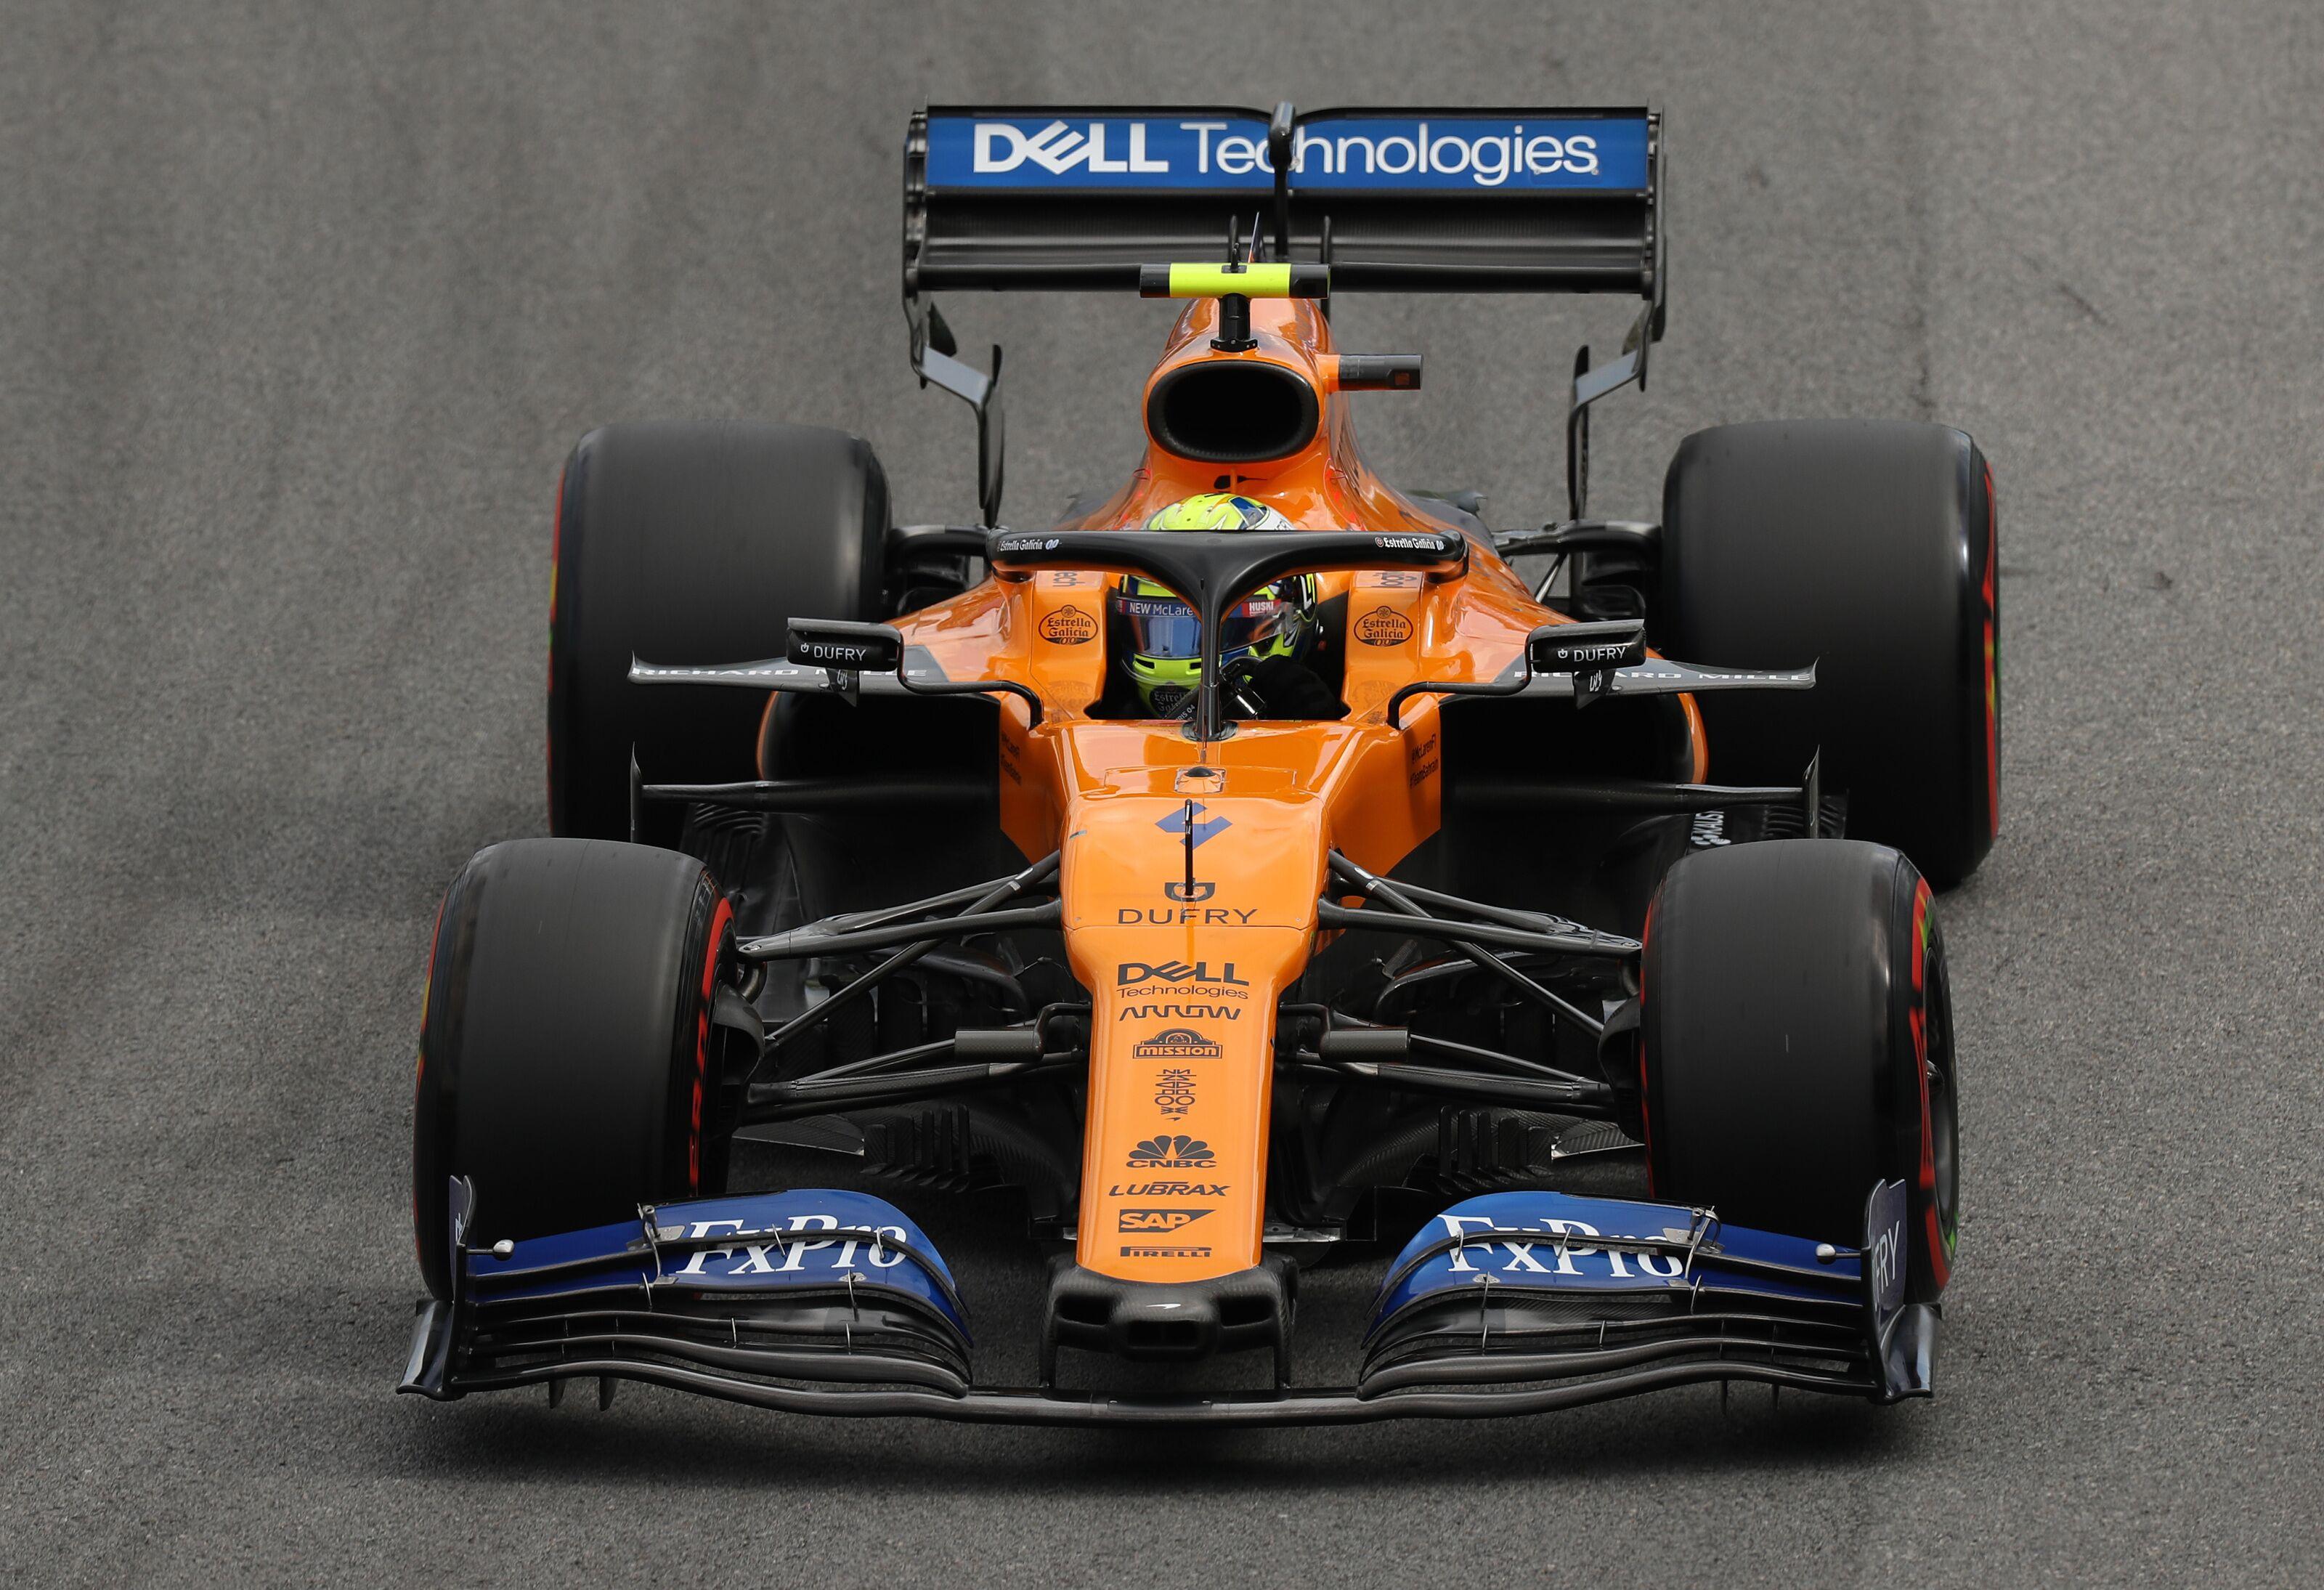 Formula 1: McLaren win 2019 'best of the rest' title